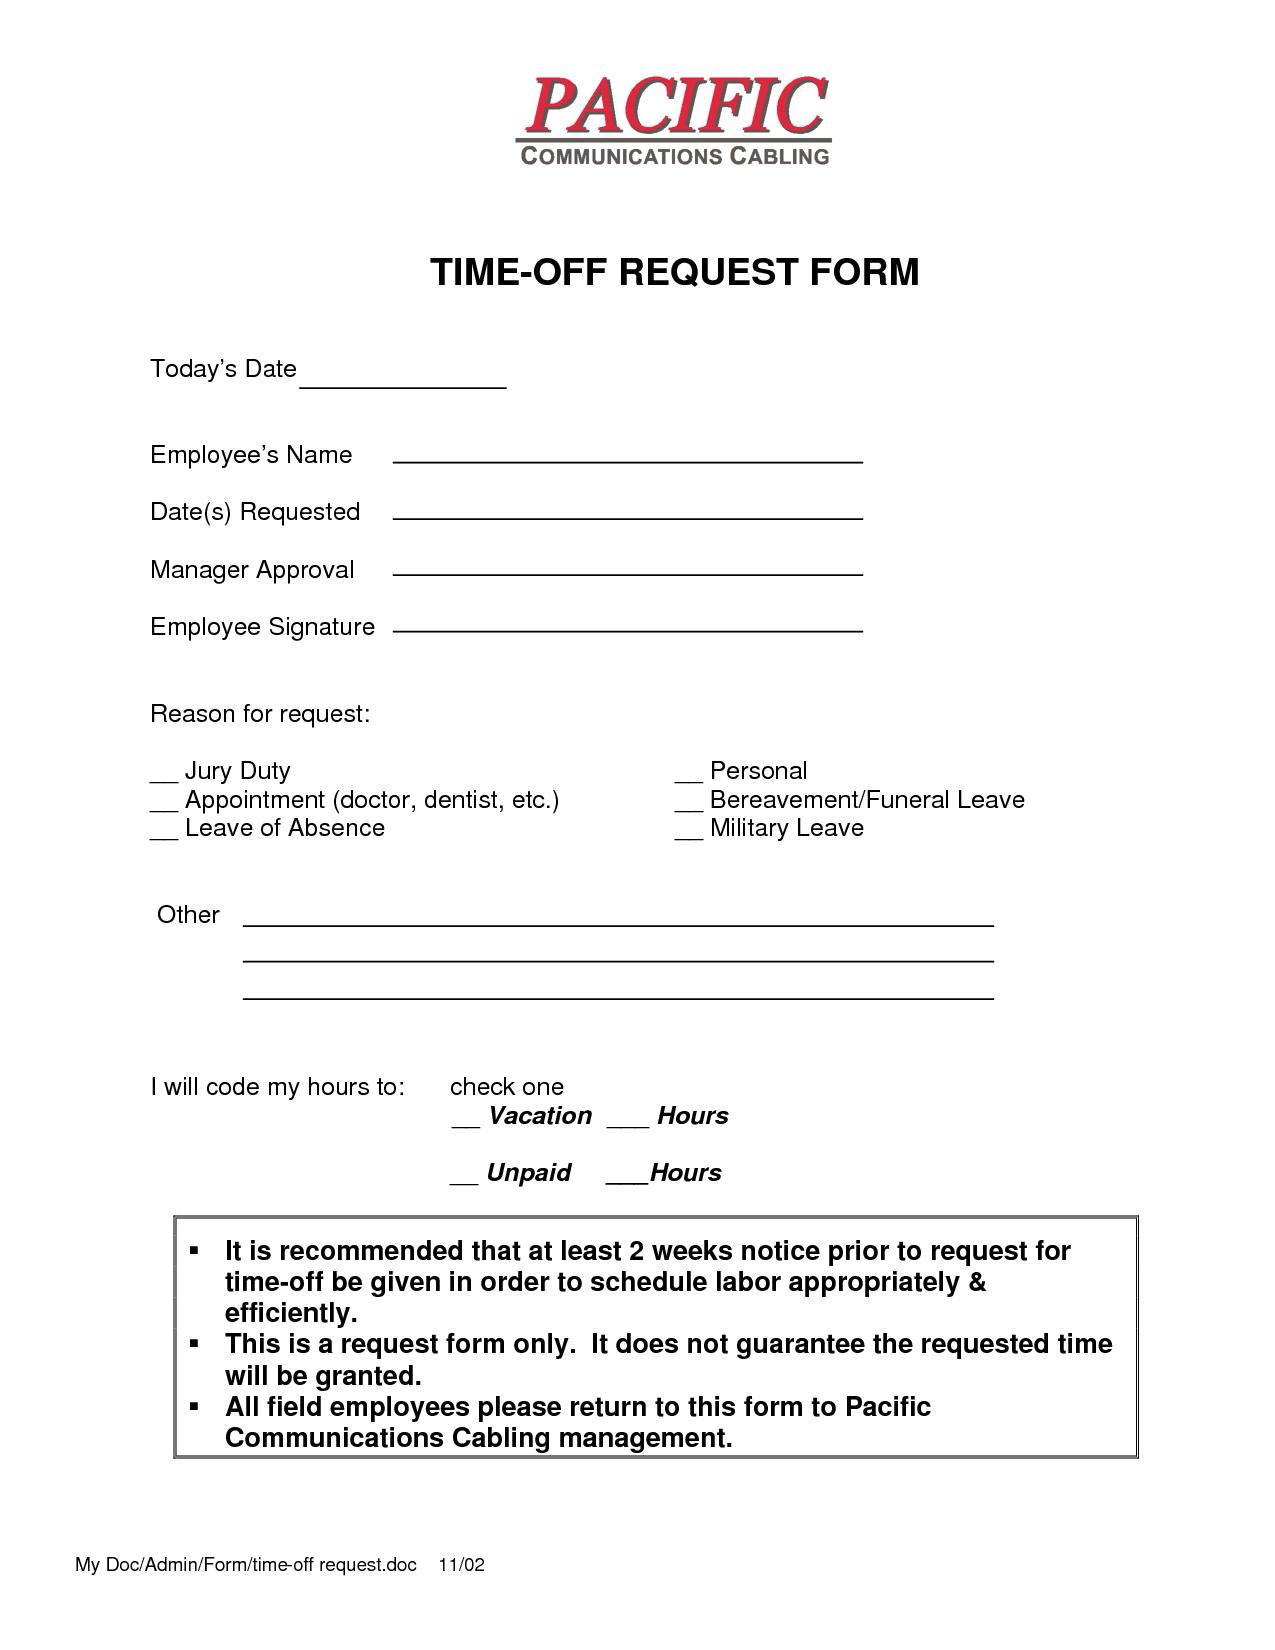 Leave Request Form Sample Timeoffrequestformtemplate2 1275×1650  Work  Pinterest .